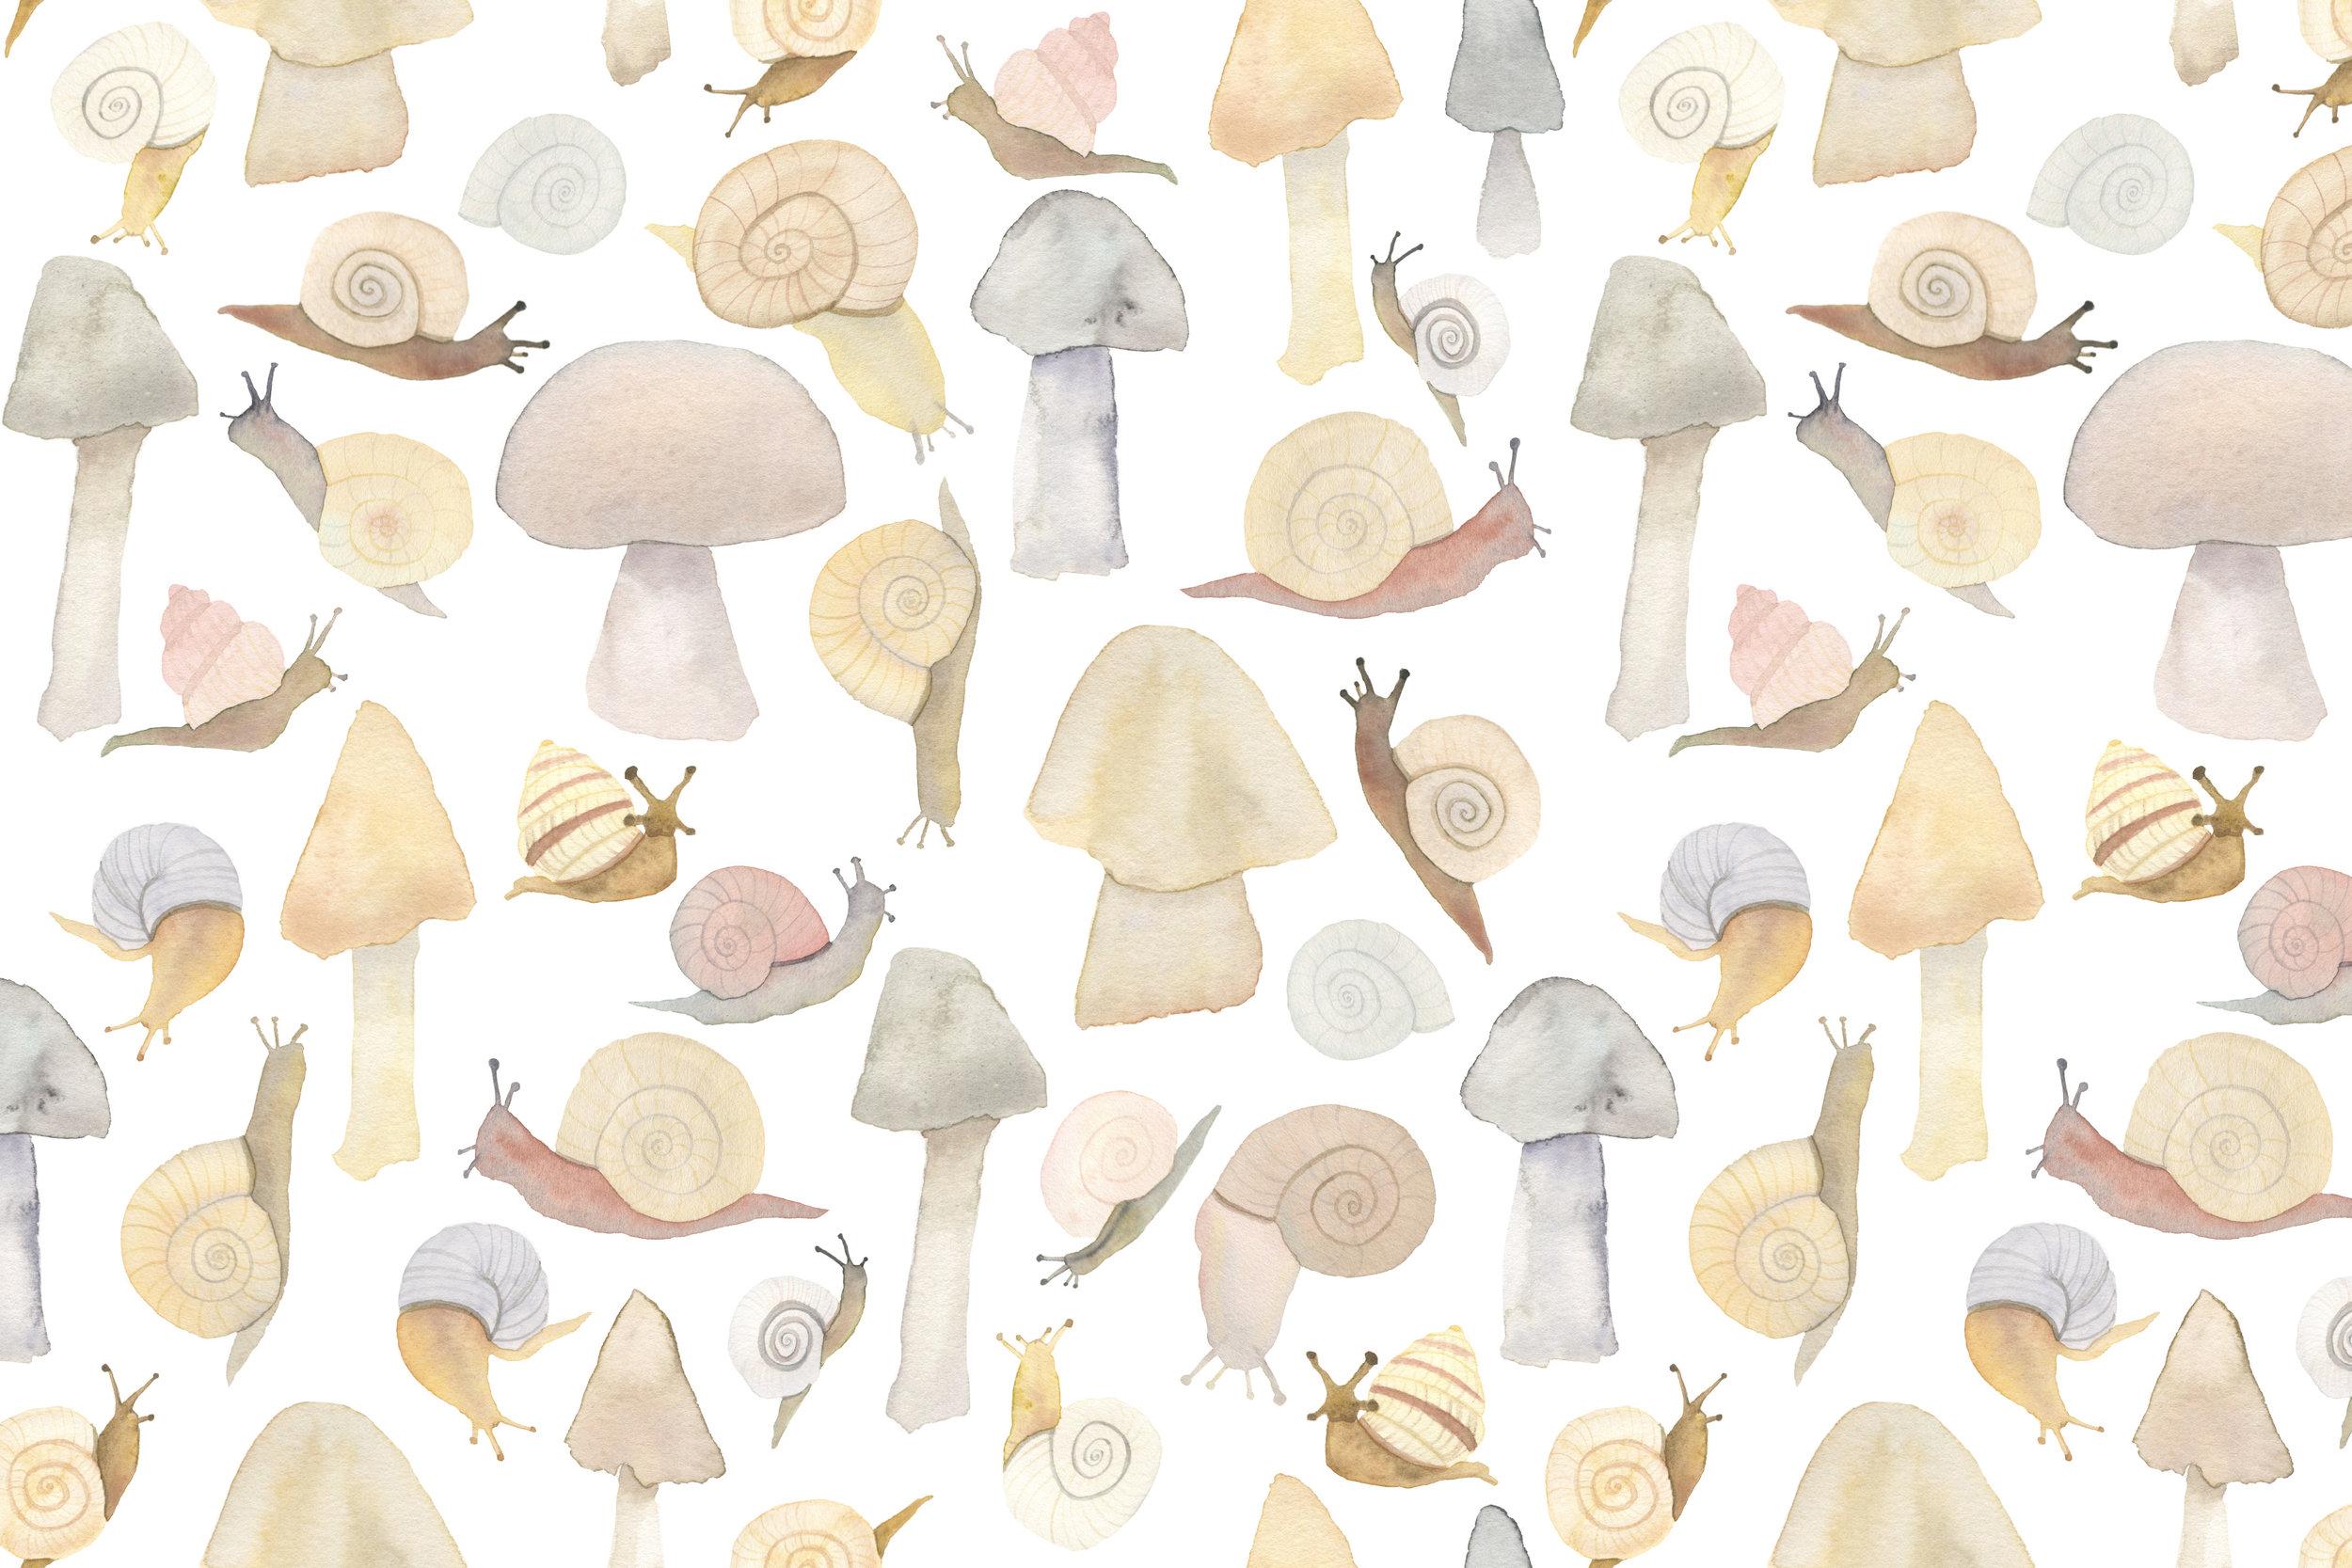 mushrooms and snails.jpg